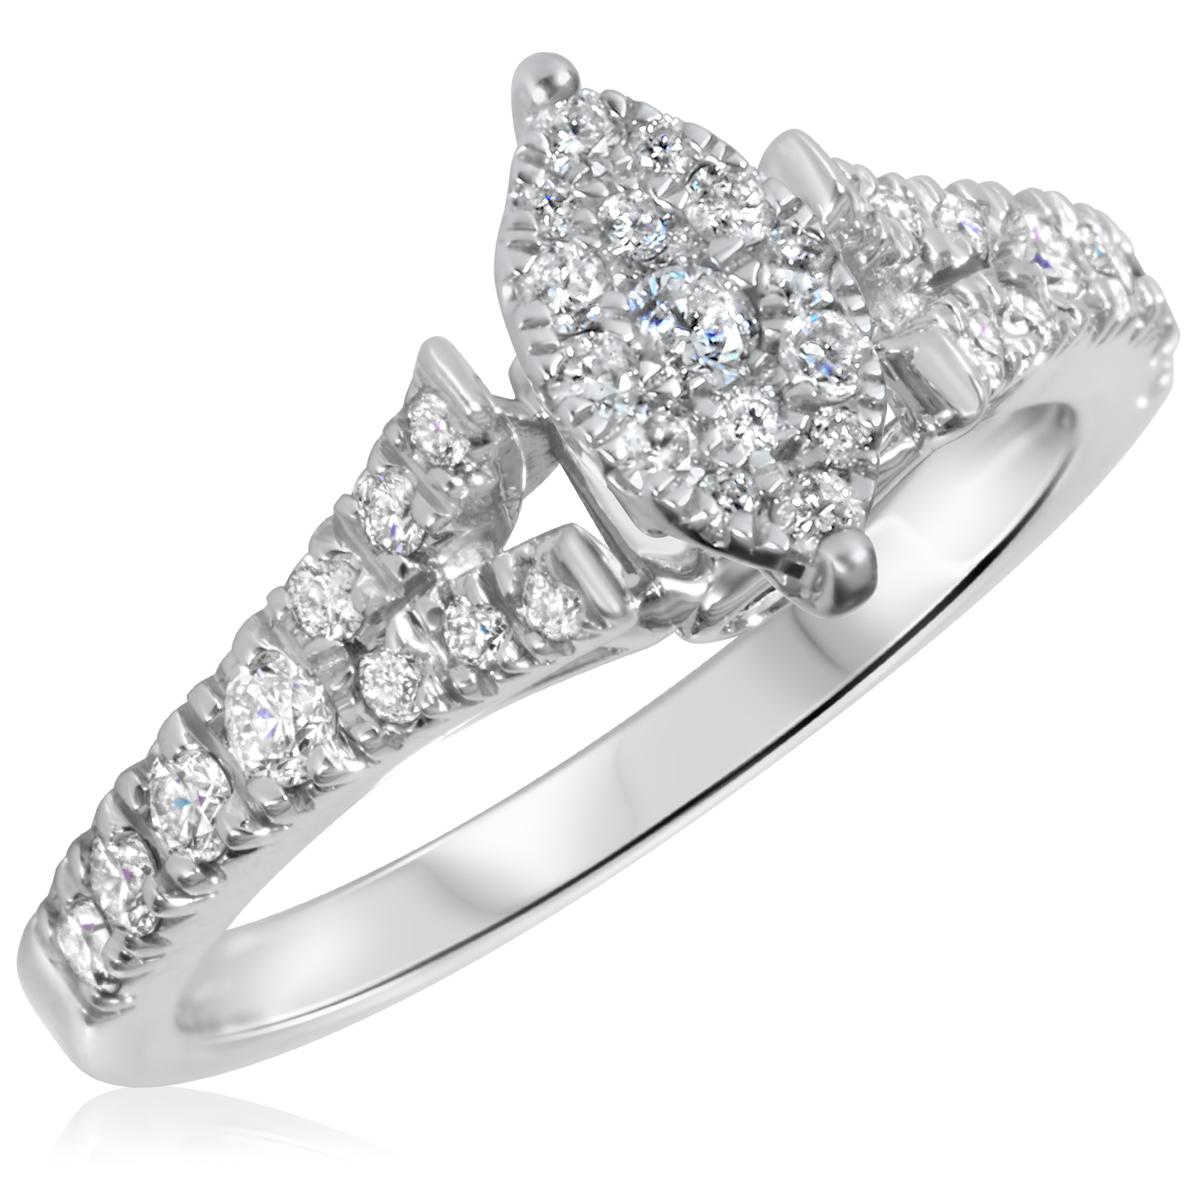 5/8 CT. T.W. Diamond Ladies Engagement Ring 10K White Gold- Size 8